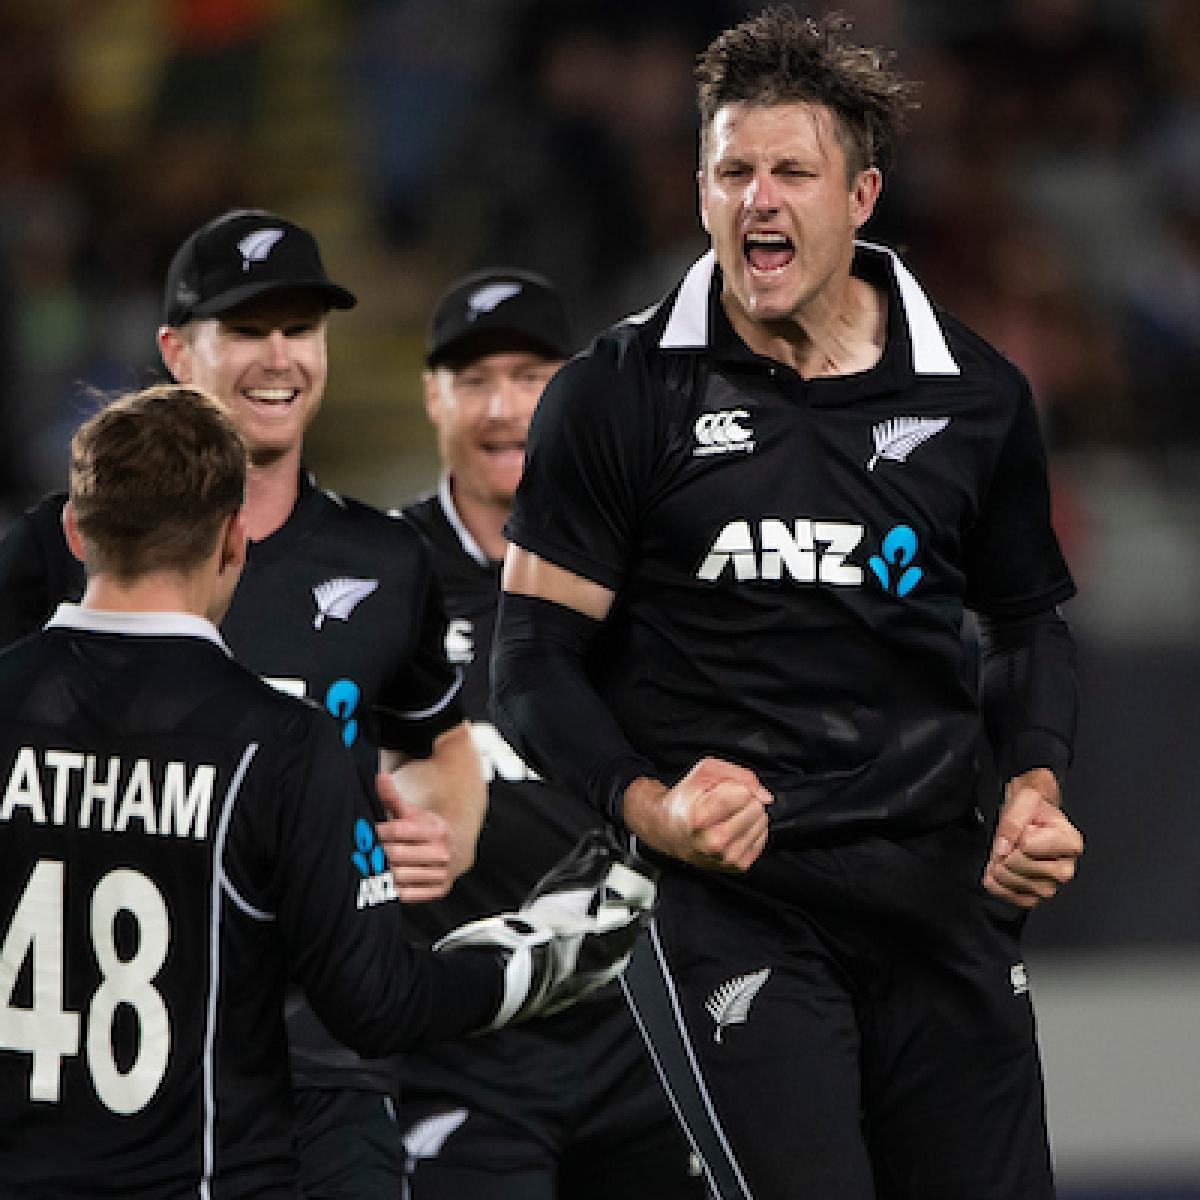 NZ vs IND 2nd ODI: New Zealand win by 22 runs